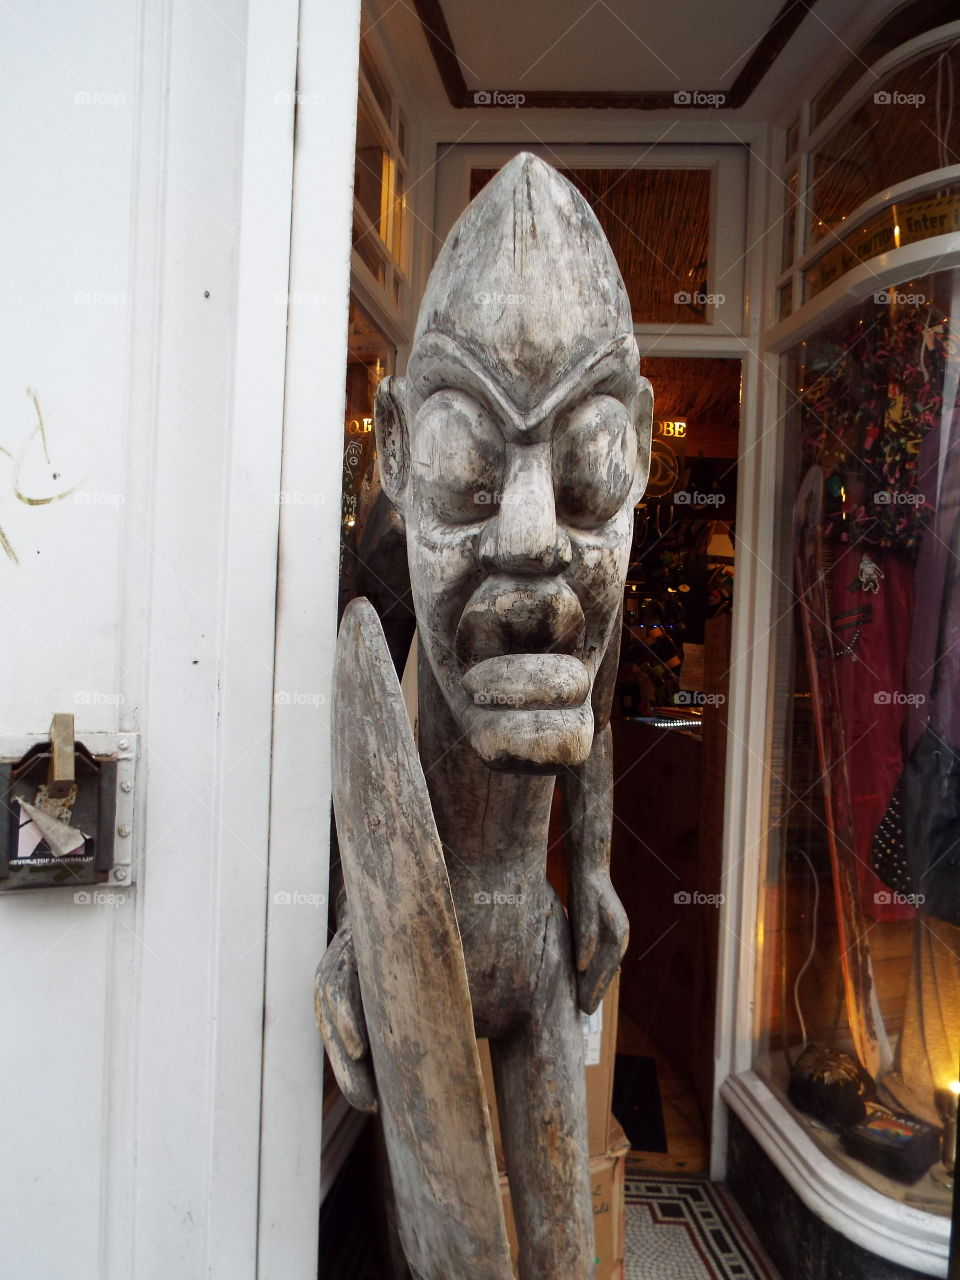 Bud Eyed Sculpture